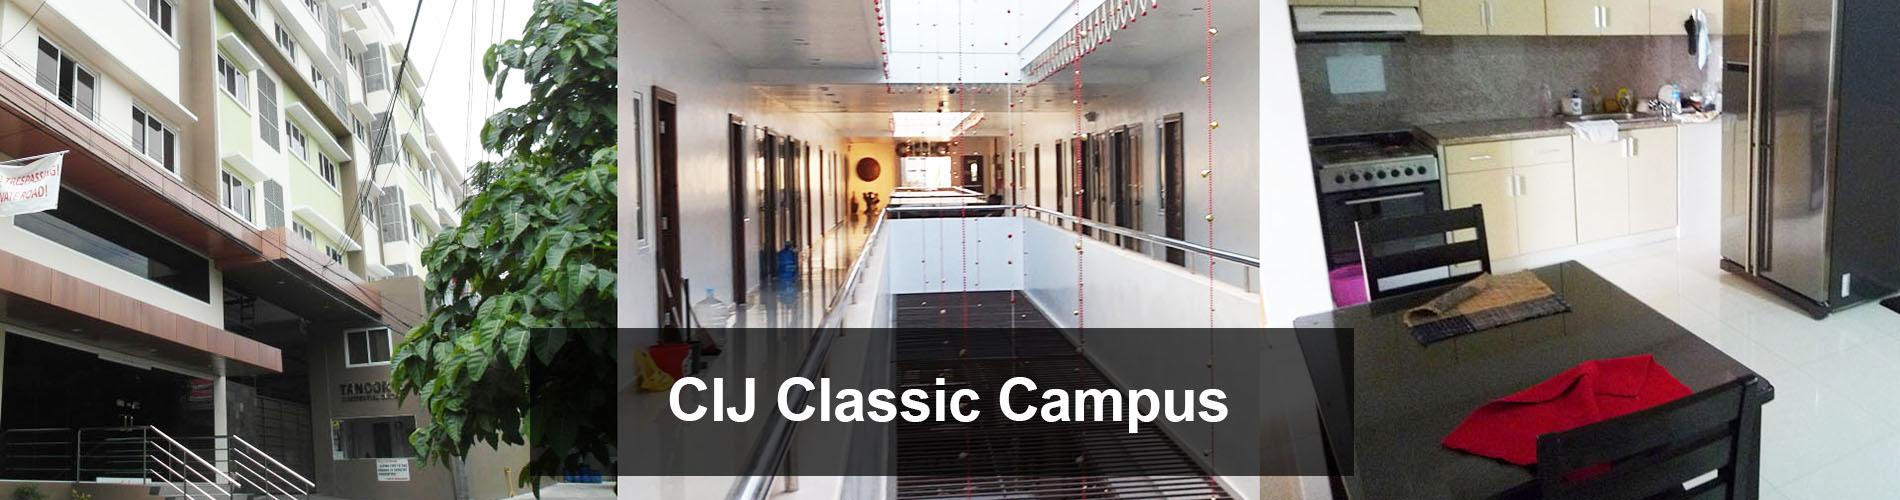 CEBU CIJ Academy Classic Campus